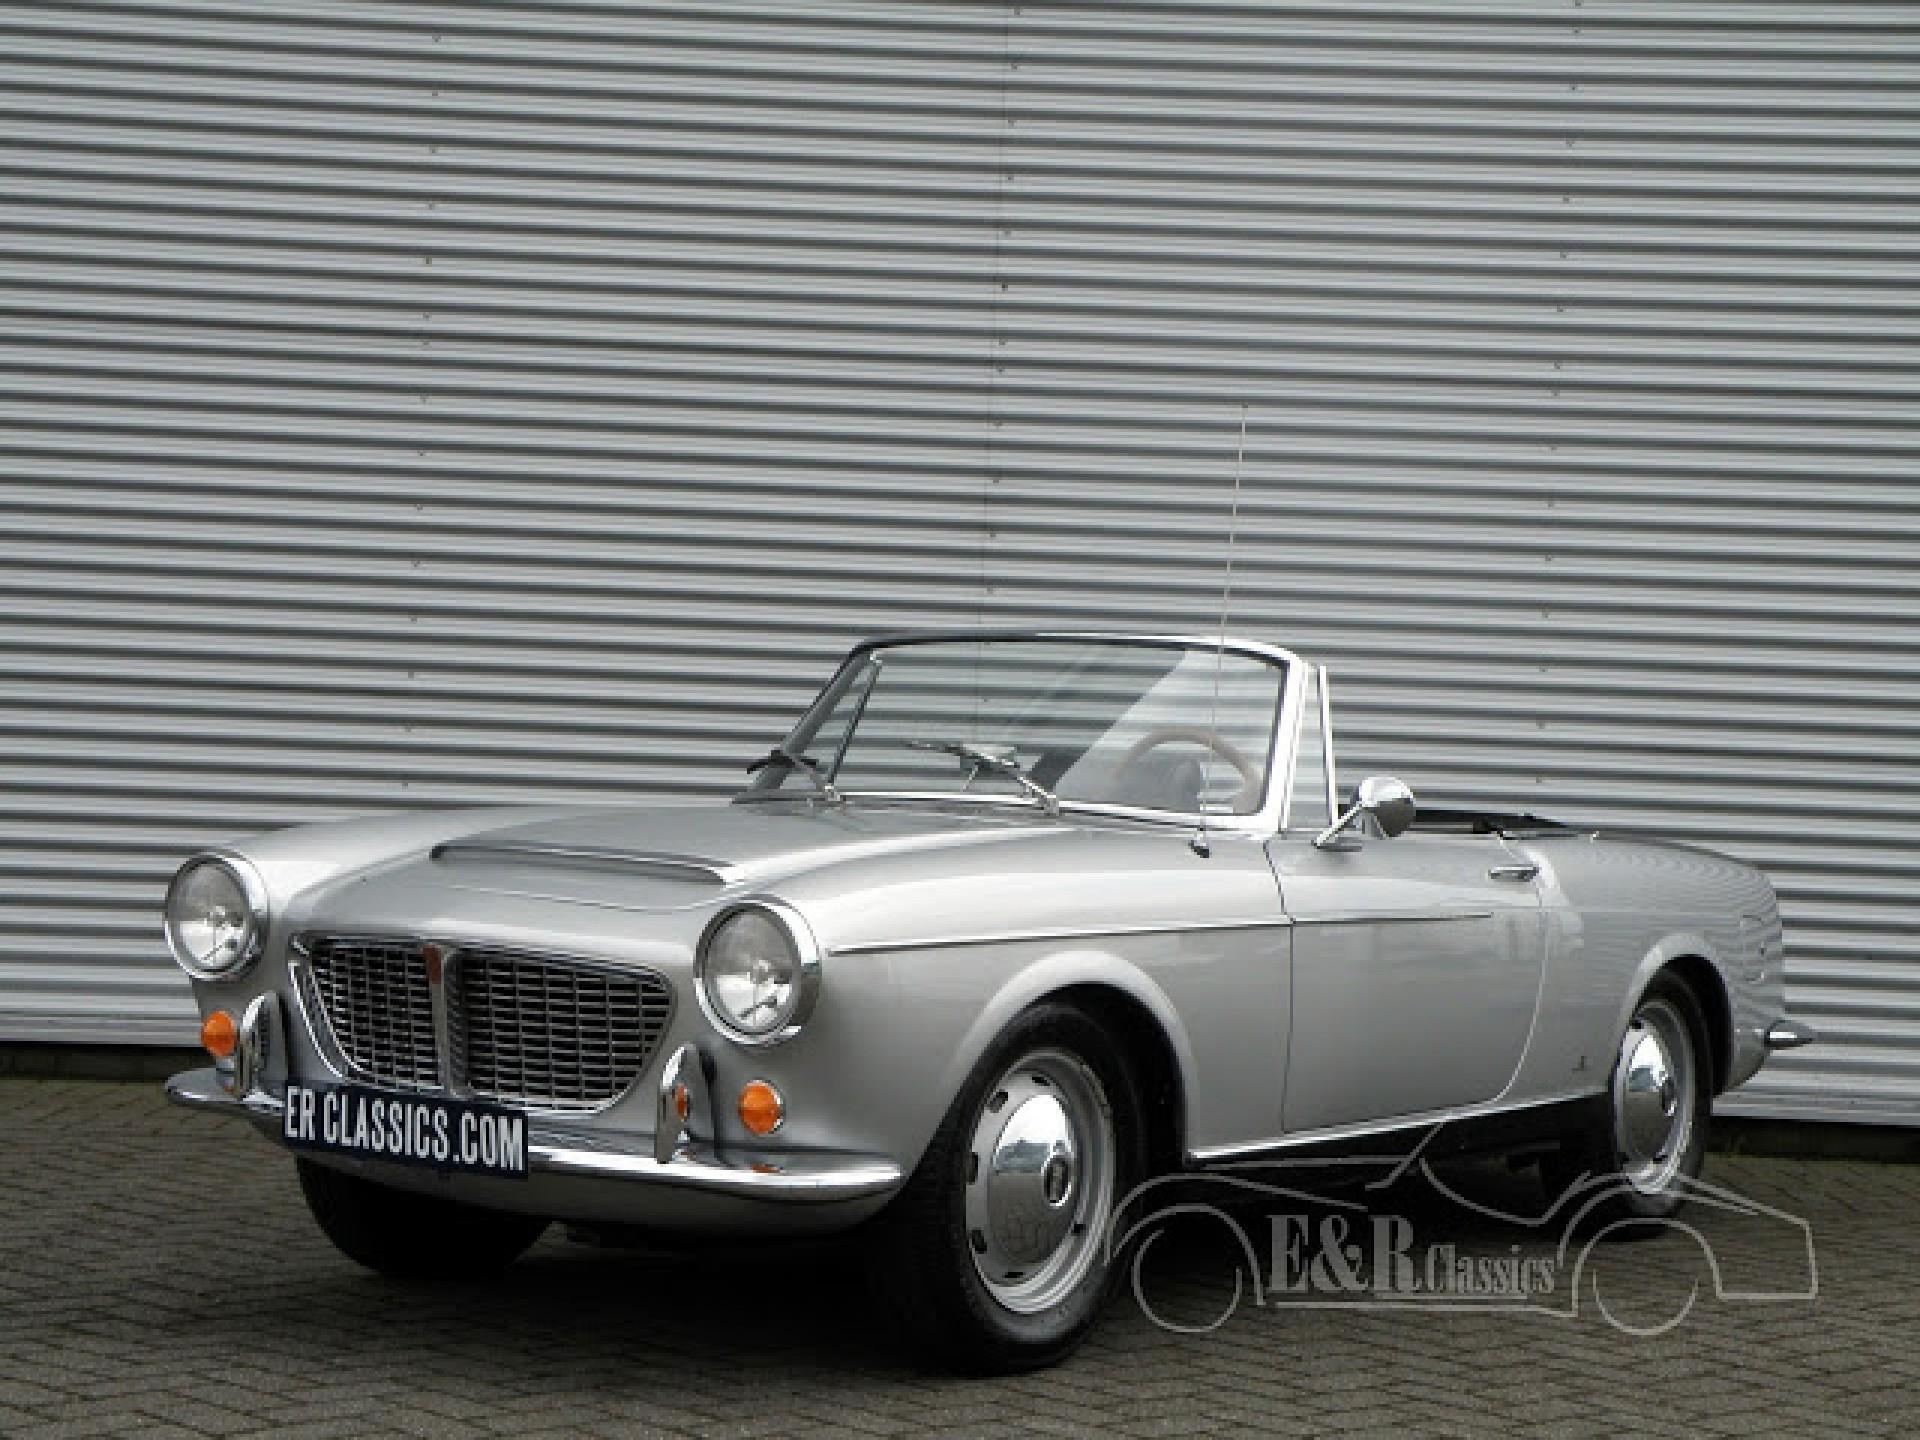 Fiat Garage Nijmegen : Fiat classic cars fiat oldtimers for sale at e r classic cars